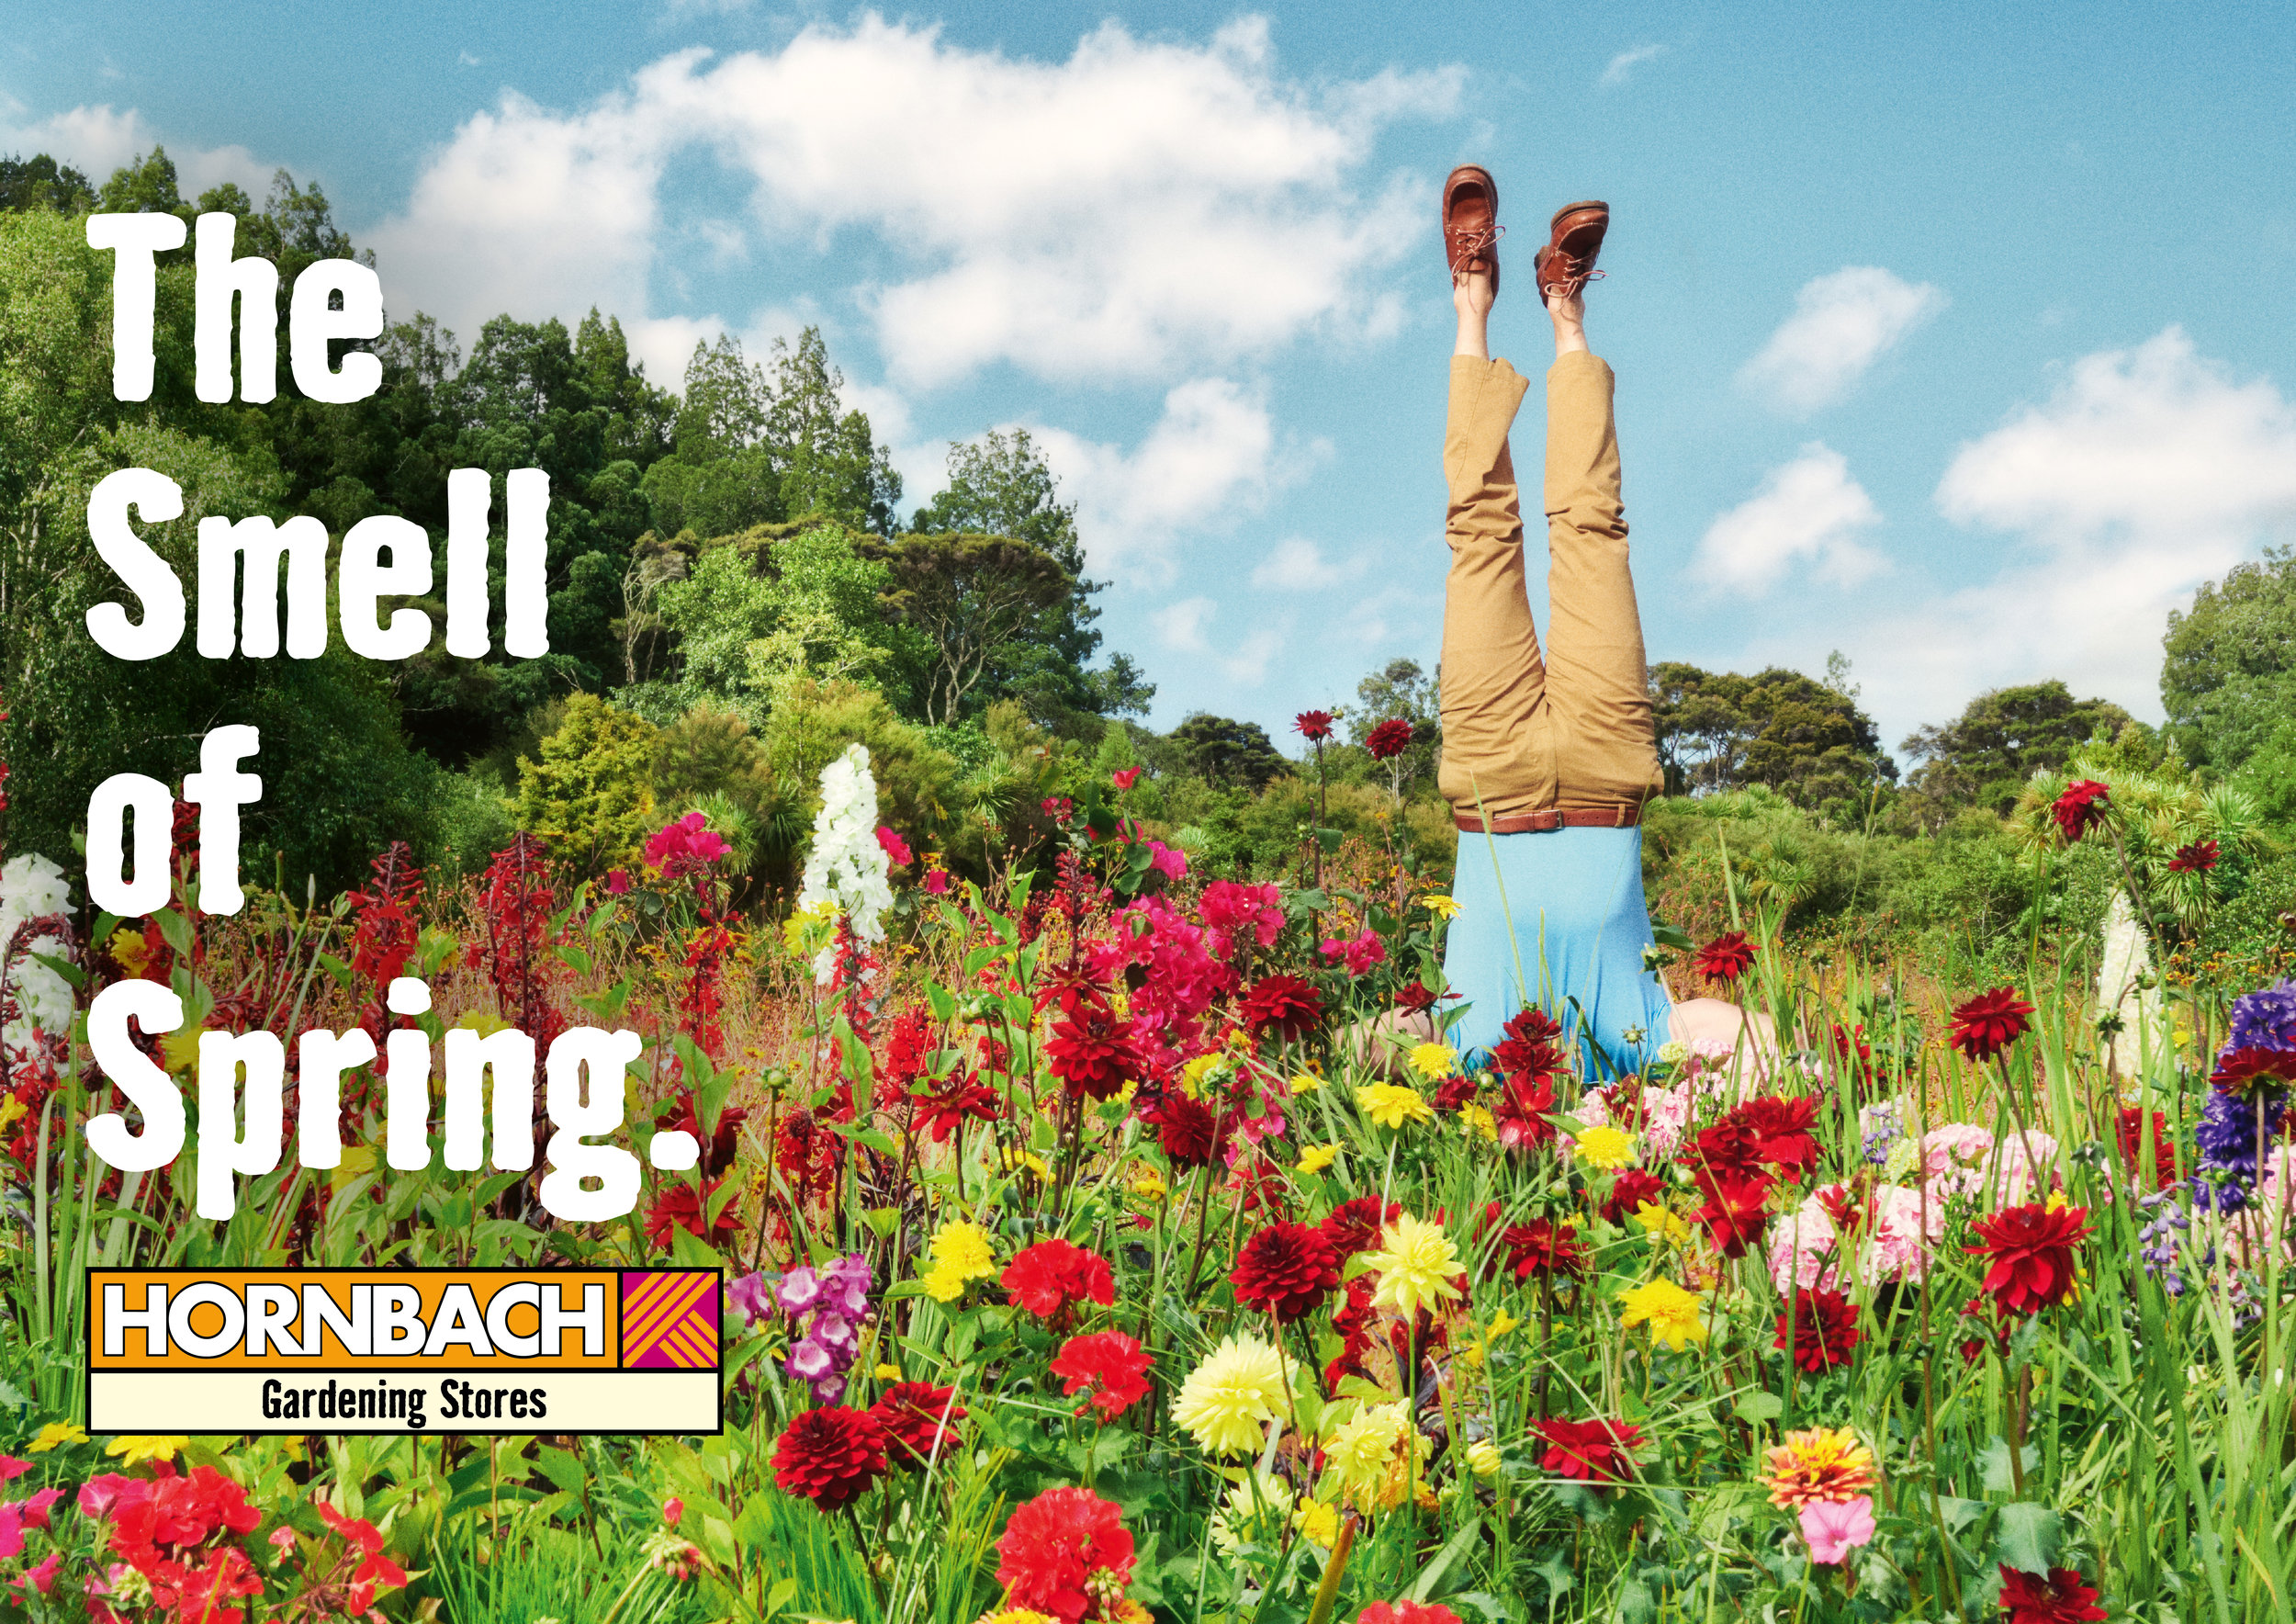 HORNBACH_Smell_of_Spring_Flowers_RGB.jpg